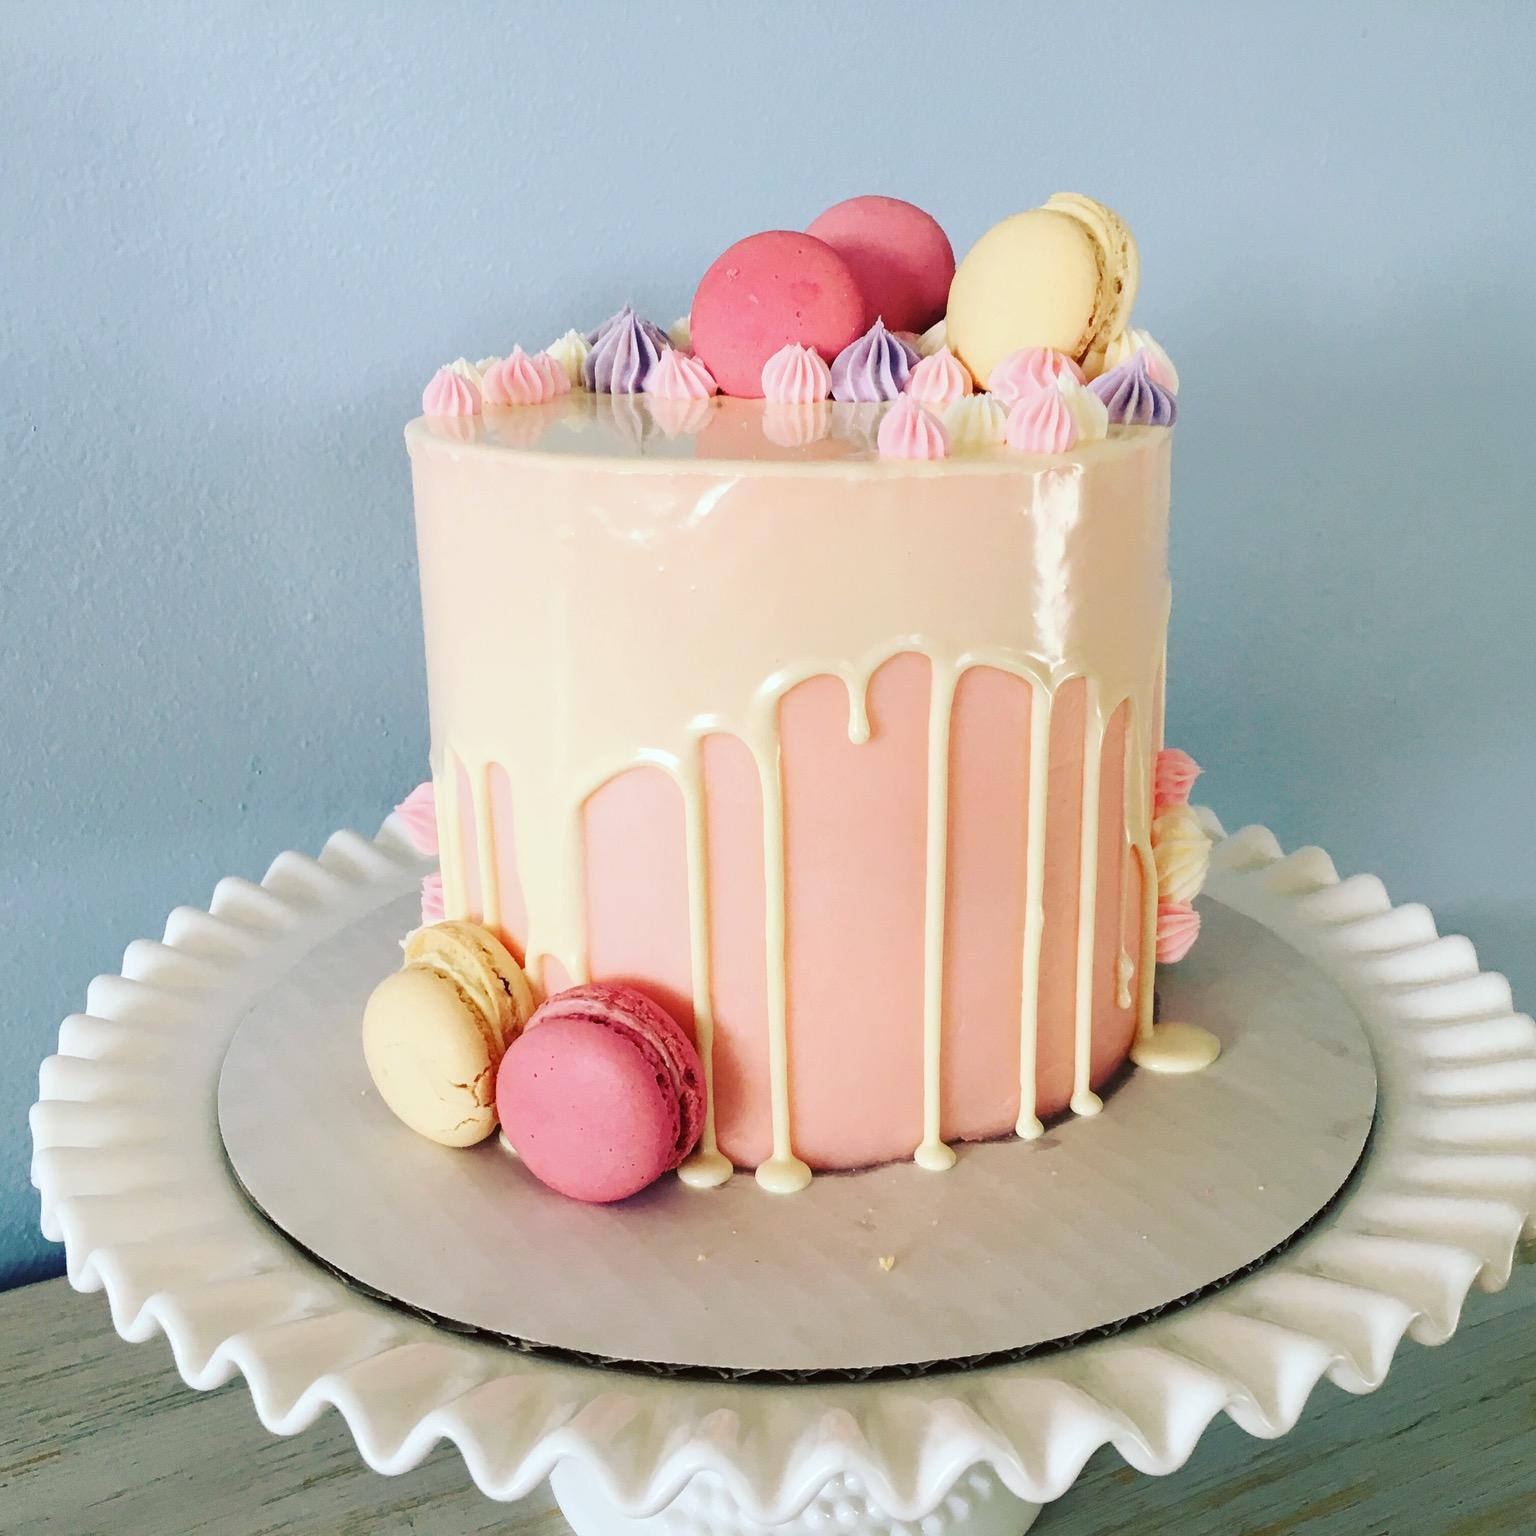 Macaron Cake Buttercream Cake Decorating Icing Dessert Sugar Cake Torte Pasteles Sugar Paste Sweetness Whipped Cream